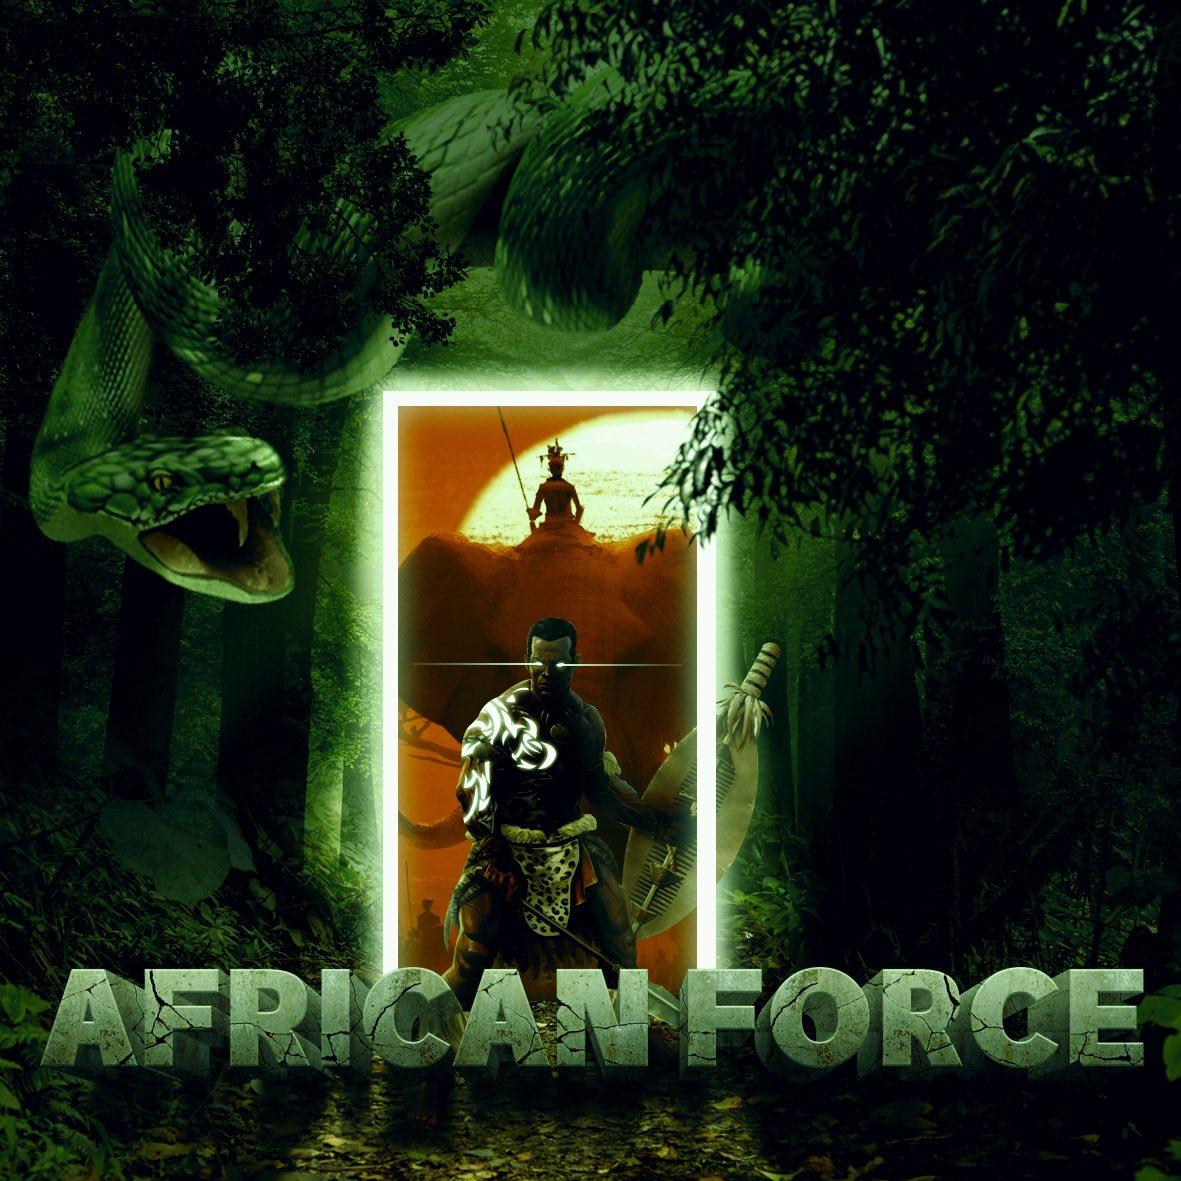 muhammedrigal: My new design African forcen#adobesummit #photoshop #digitalart https://t.co/zec4vtSbgW